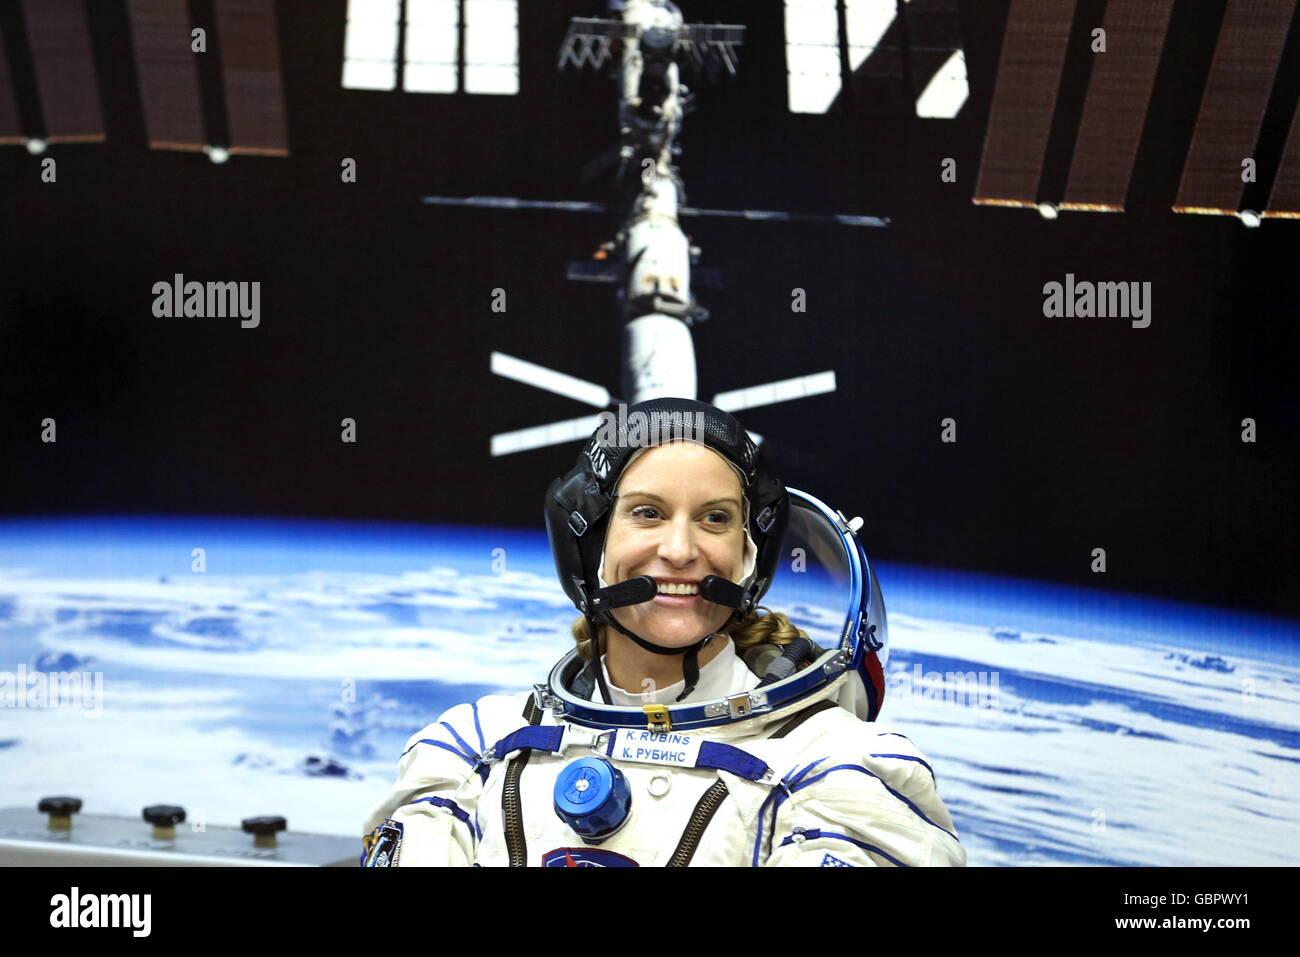 Baikonur Cosmodrome, Kazakhstan. 7th July, 2016. US astronaut Kathleen Rubins (NASA), a member of the main crew - Stock Image